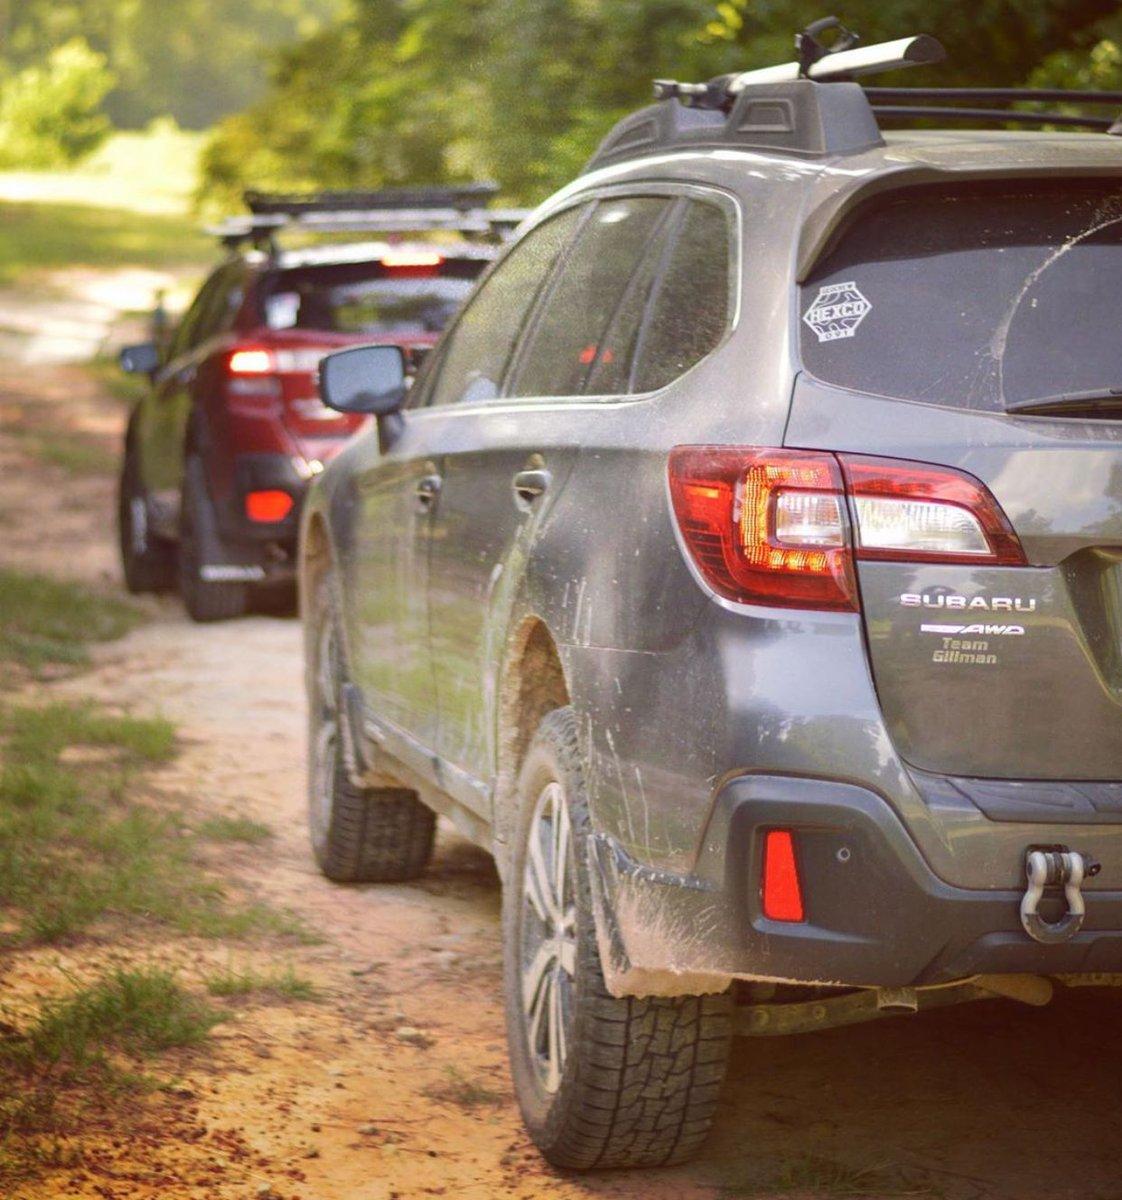 The long-lasting and dependable adventure companion you love #Outback   @lone_star_subaru   #Subaru #Subie #subieflow #subienation #subilove #HTX #houston #houstontx #texas #carsales #cars #carsforsale #autosales #car #cardealershippic.twitter.com/ckPeSzFOns